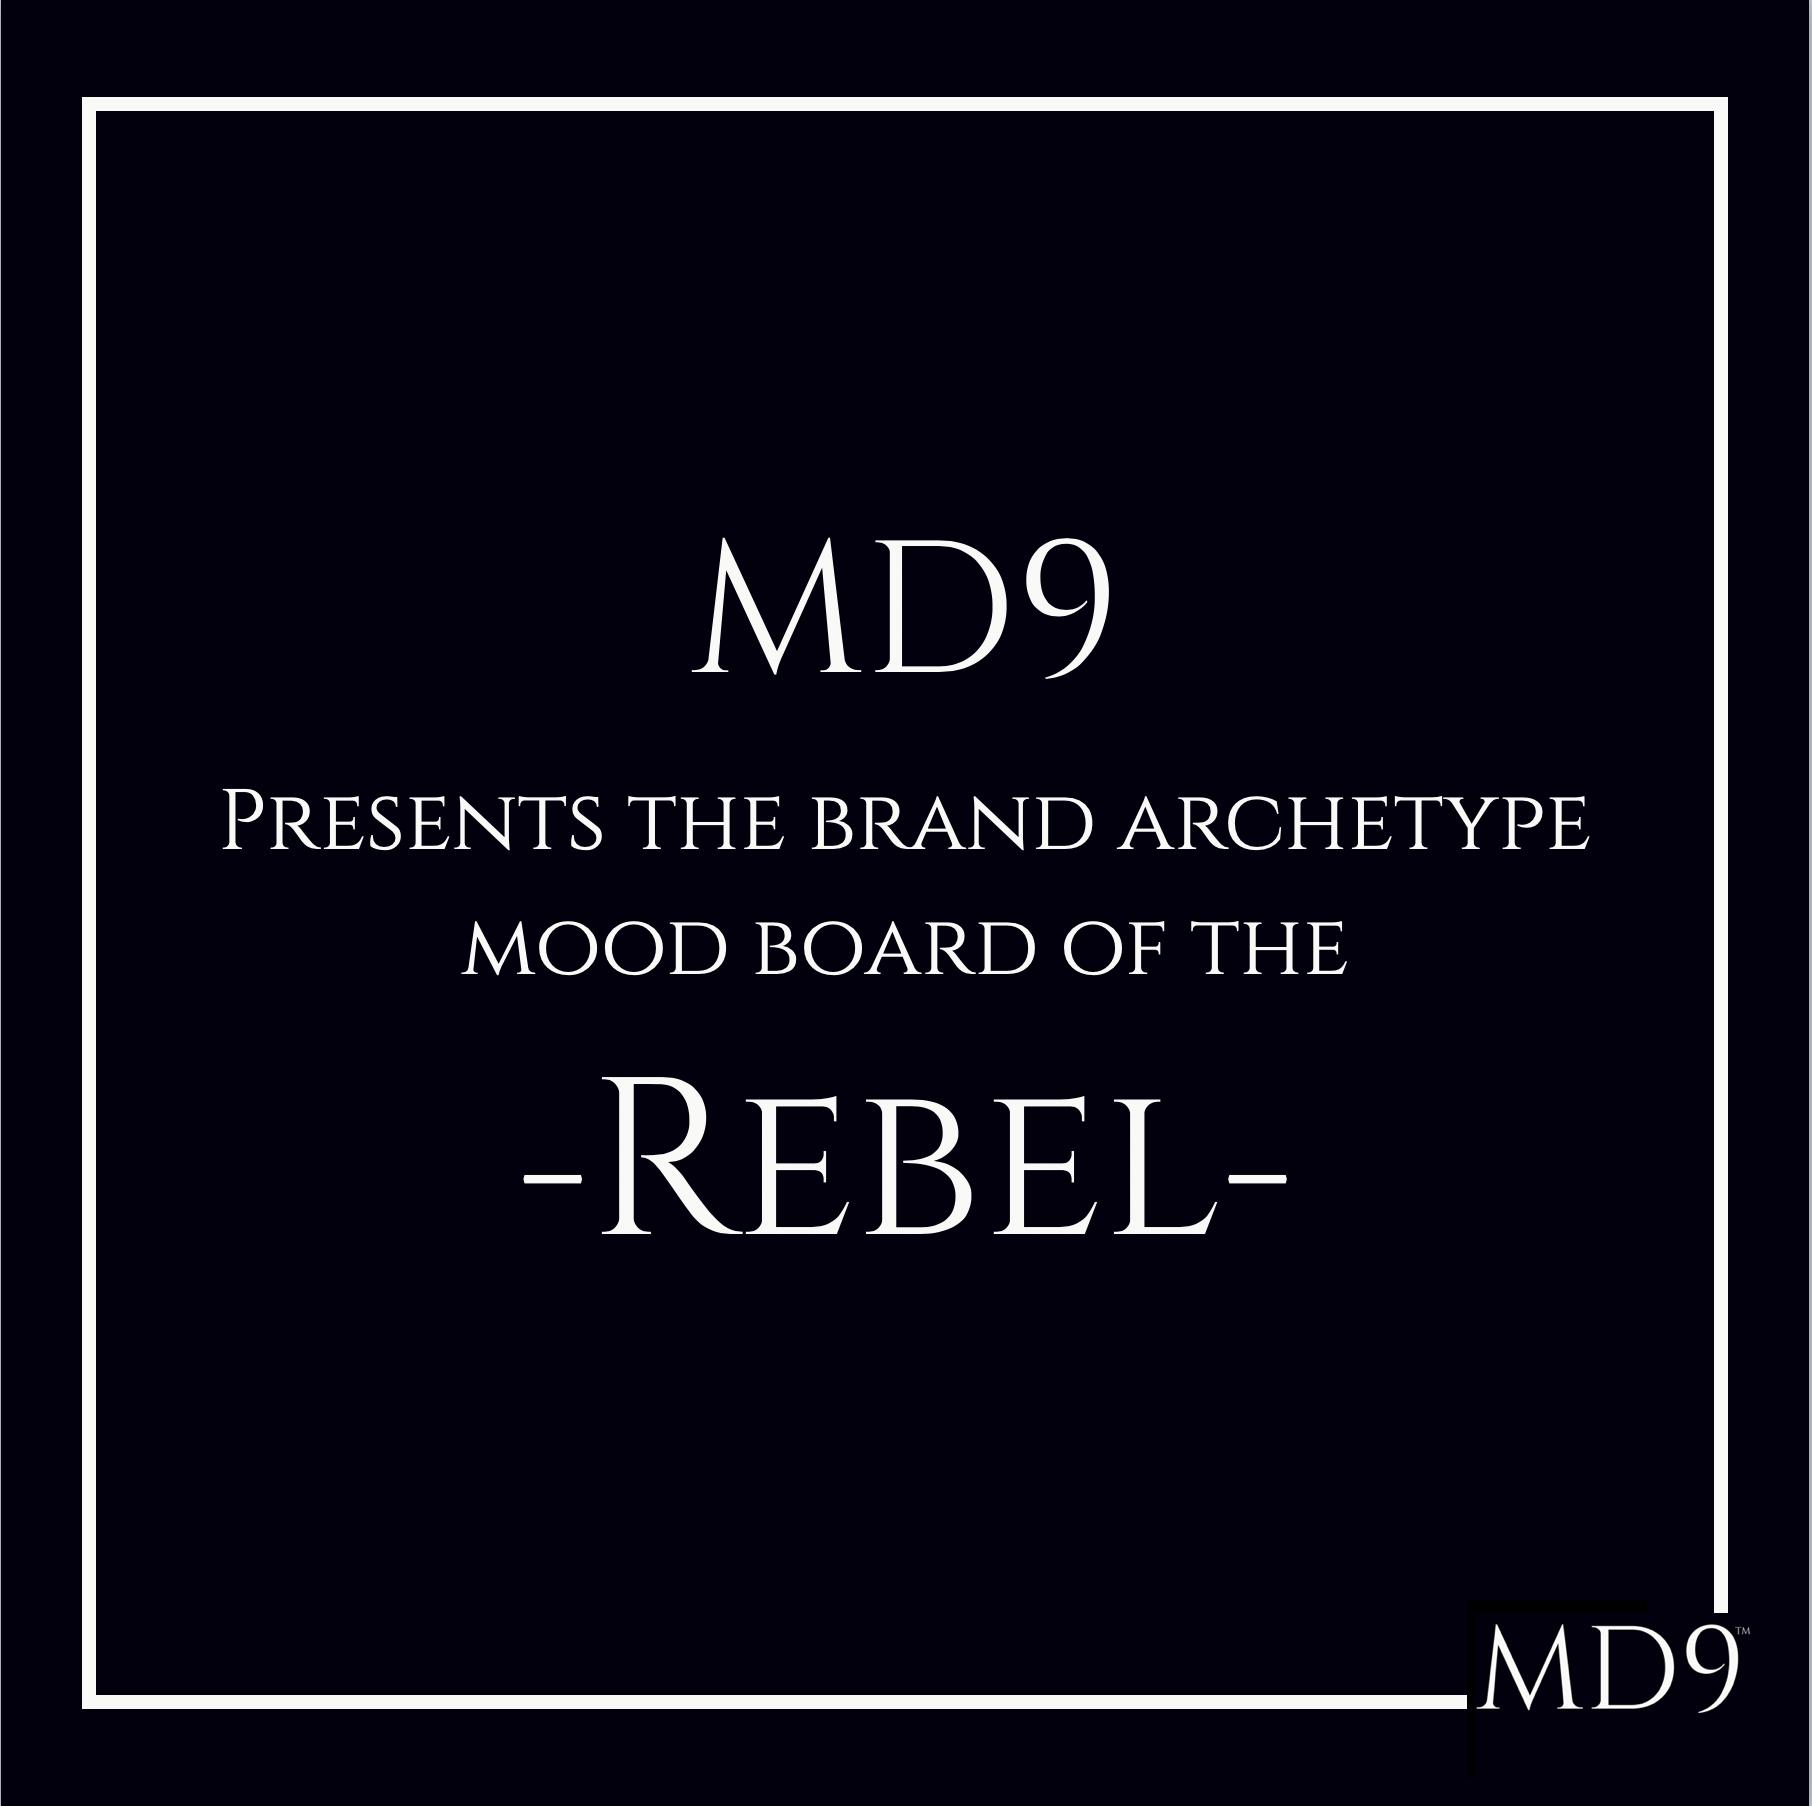 MD9's Brand Archetype Mood Board – Rebel